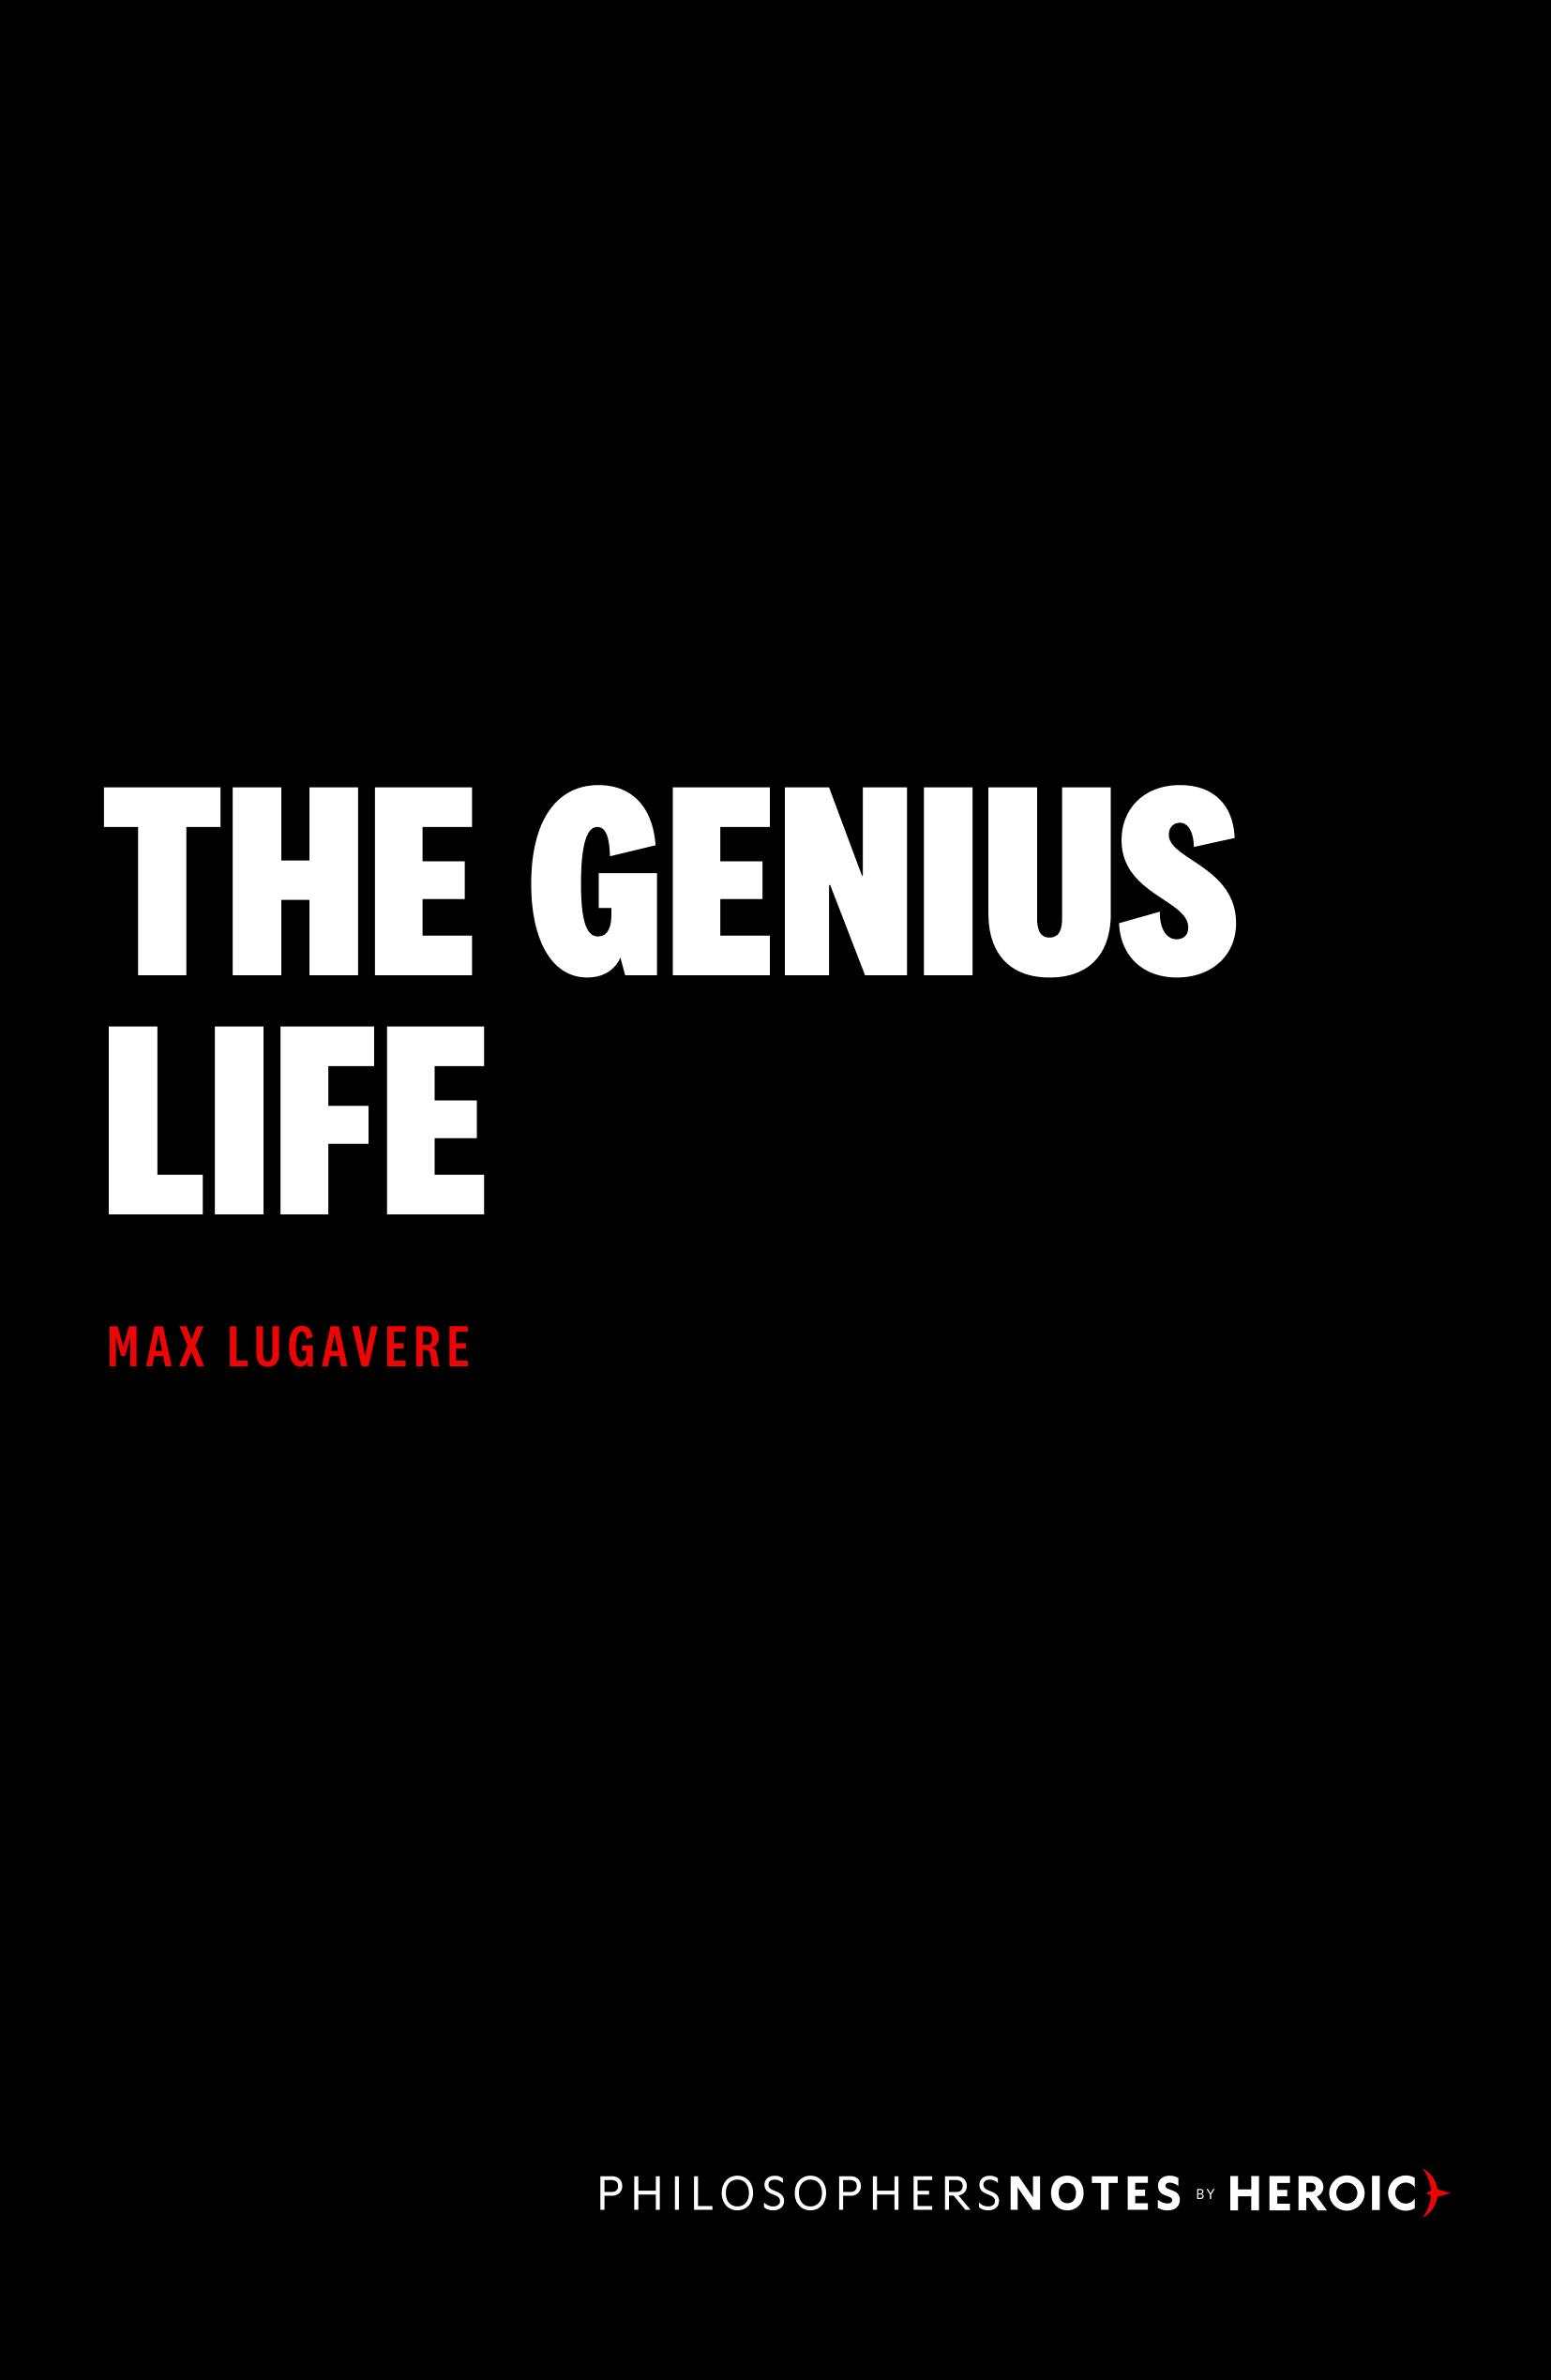 The Genius Life By Max Lugavere